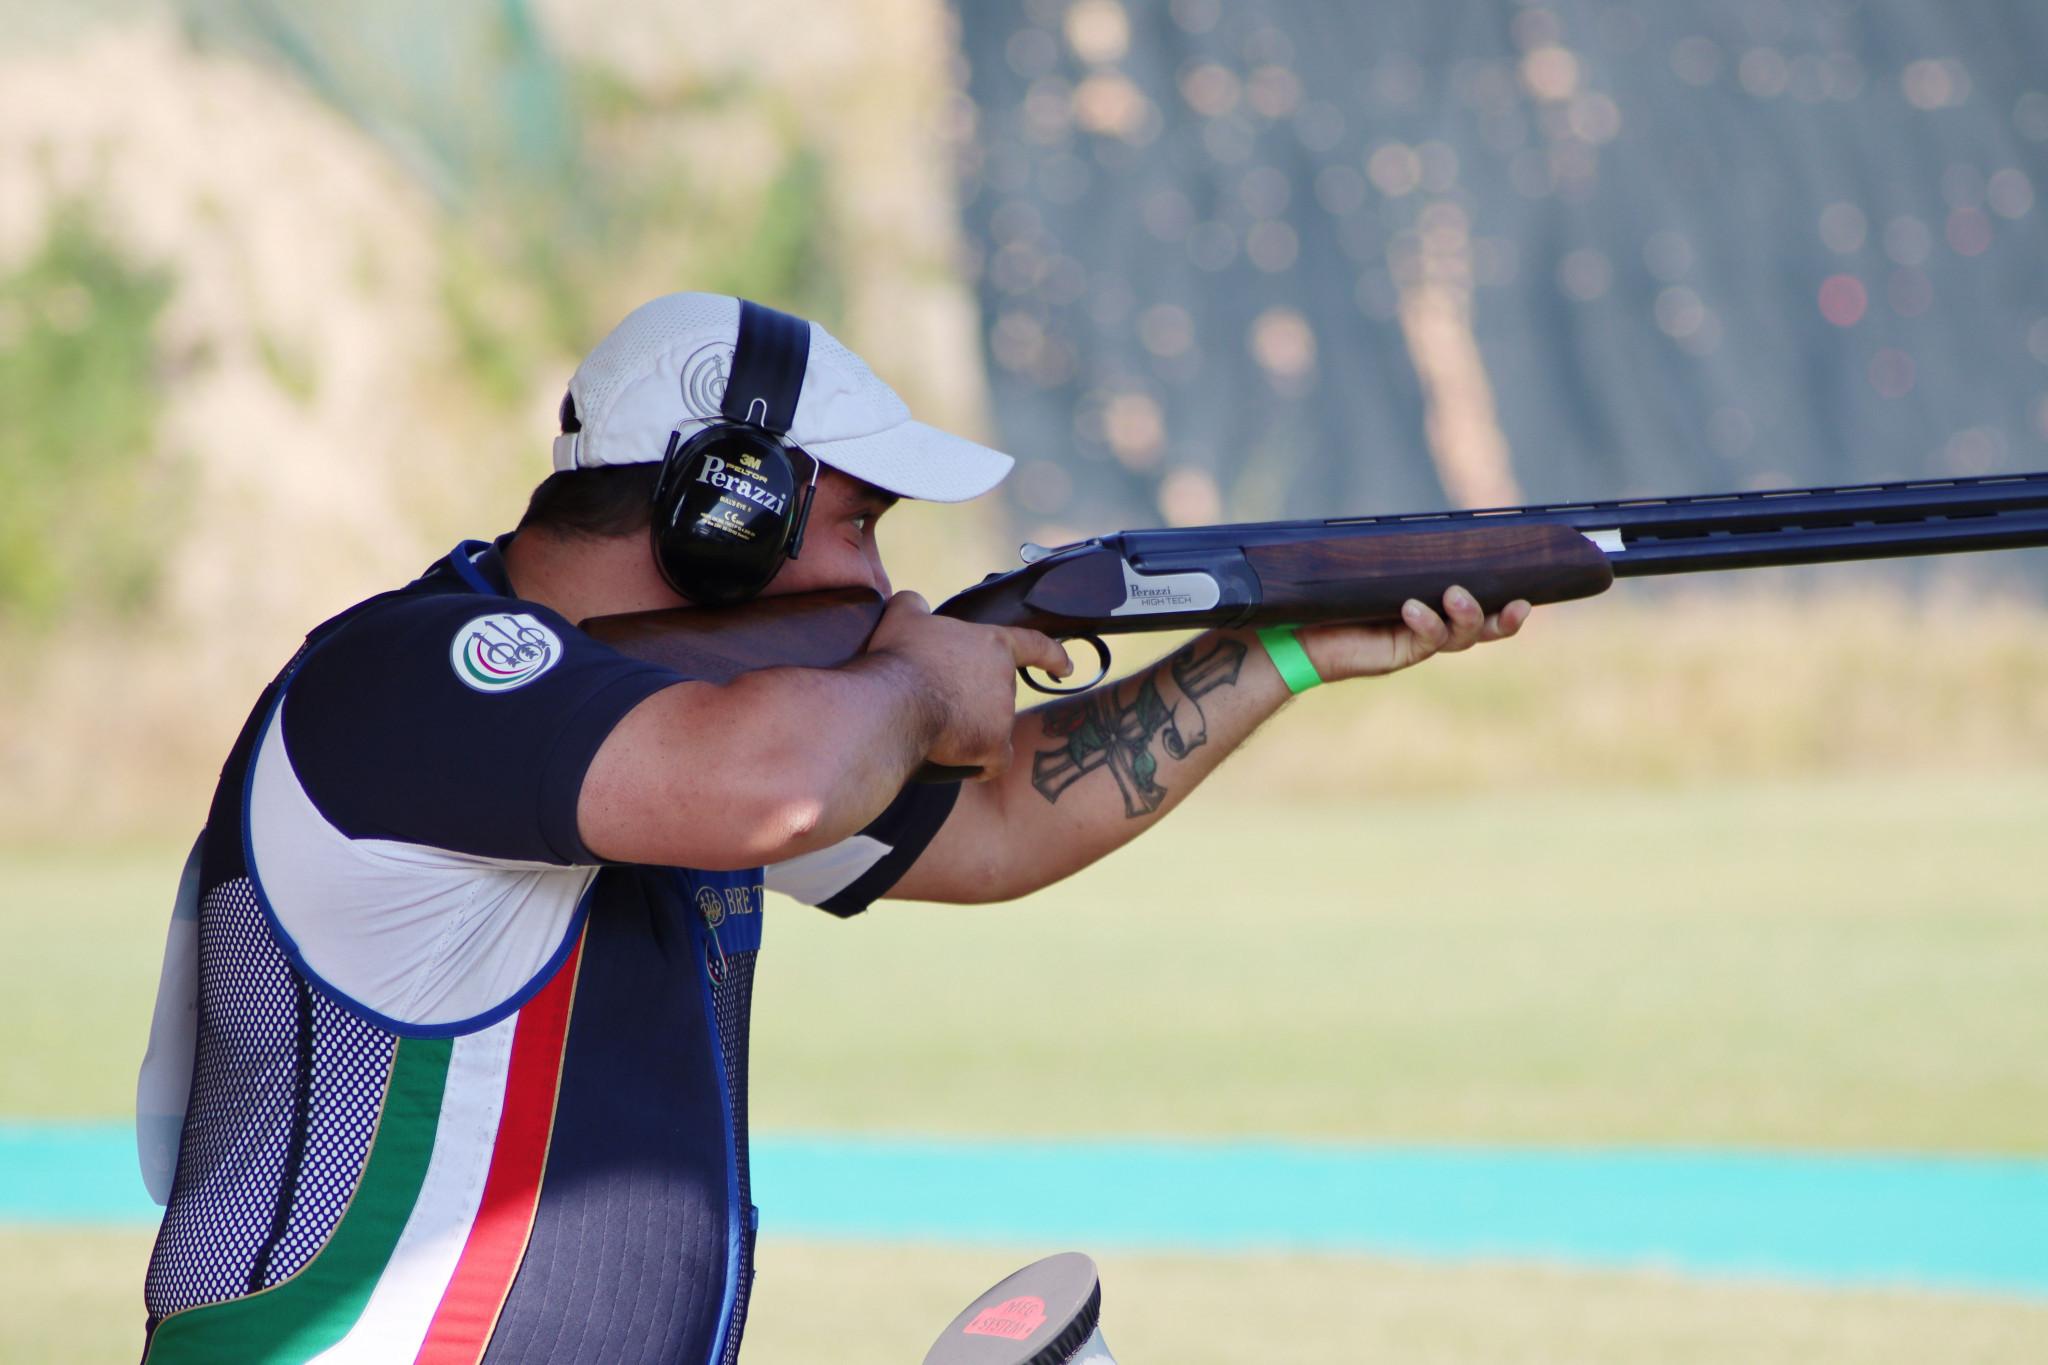 Italy dominates Lonato 2021 World Shooting Para Sport Para Trap World Championships qualifying